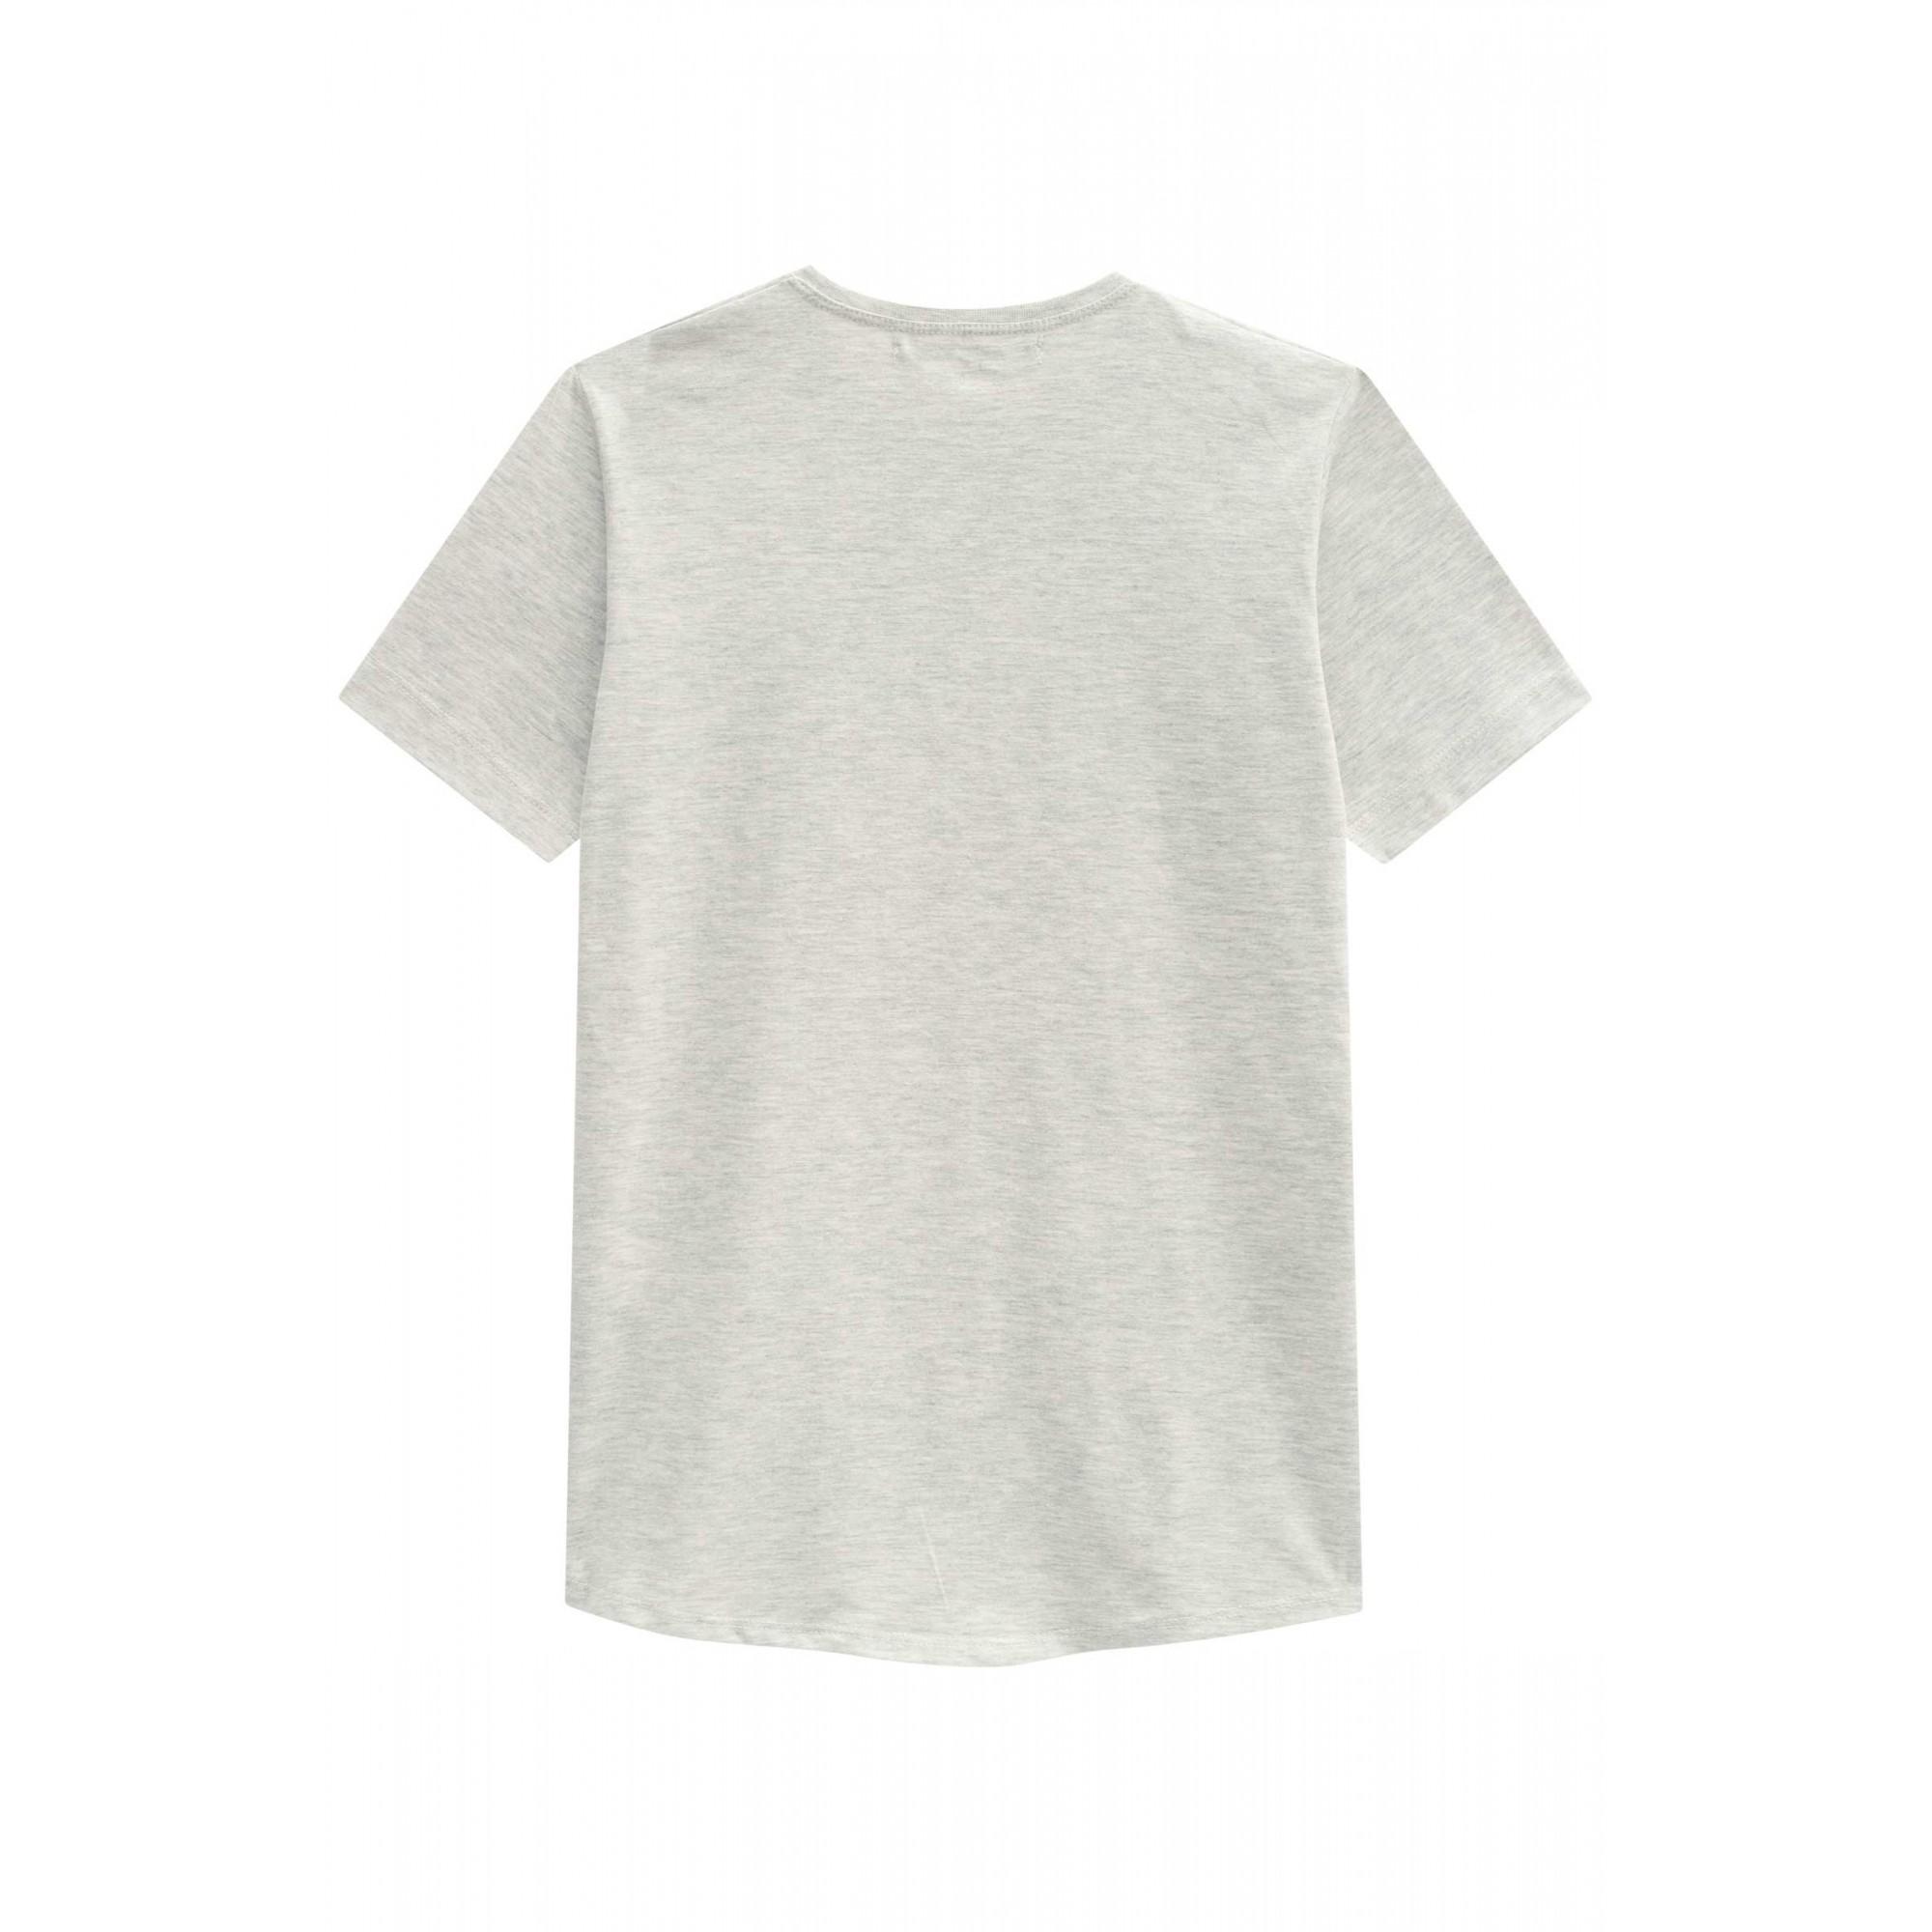 Camiseta Juvenil Mescla